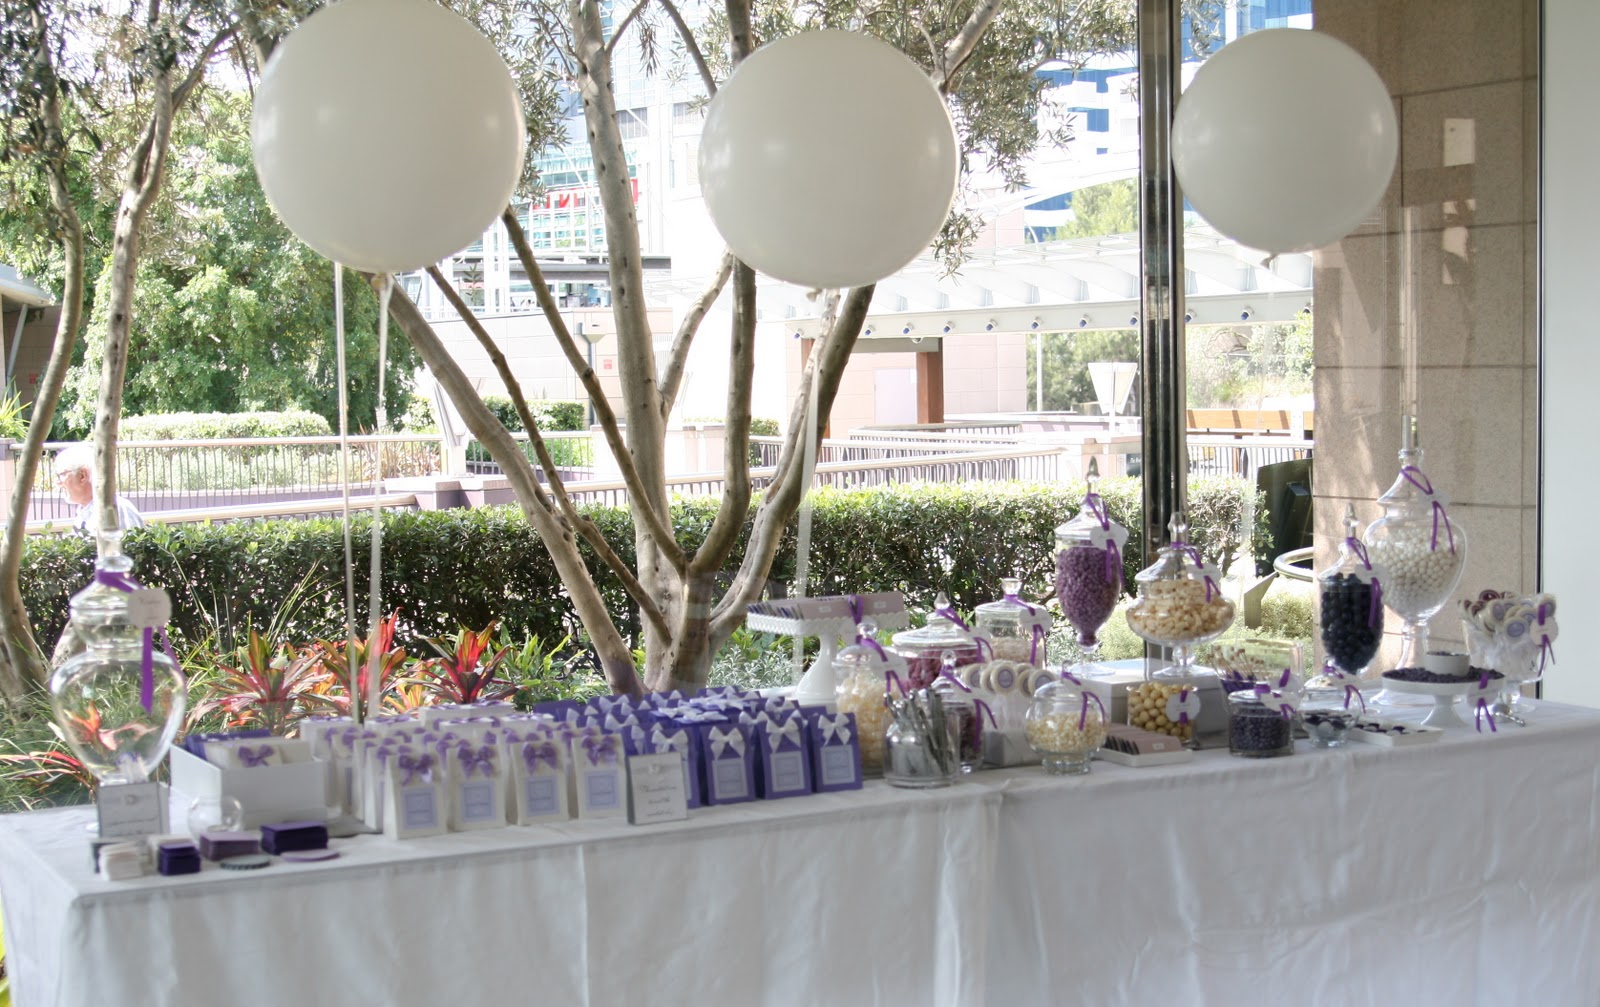 Party Butterfly: A Lavish Lavender Bridal Shower